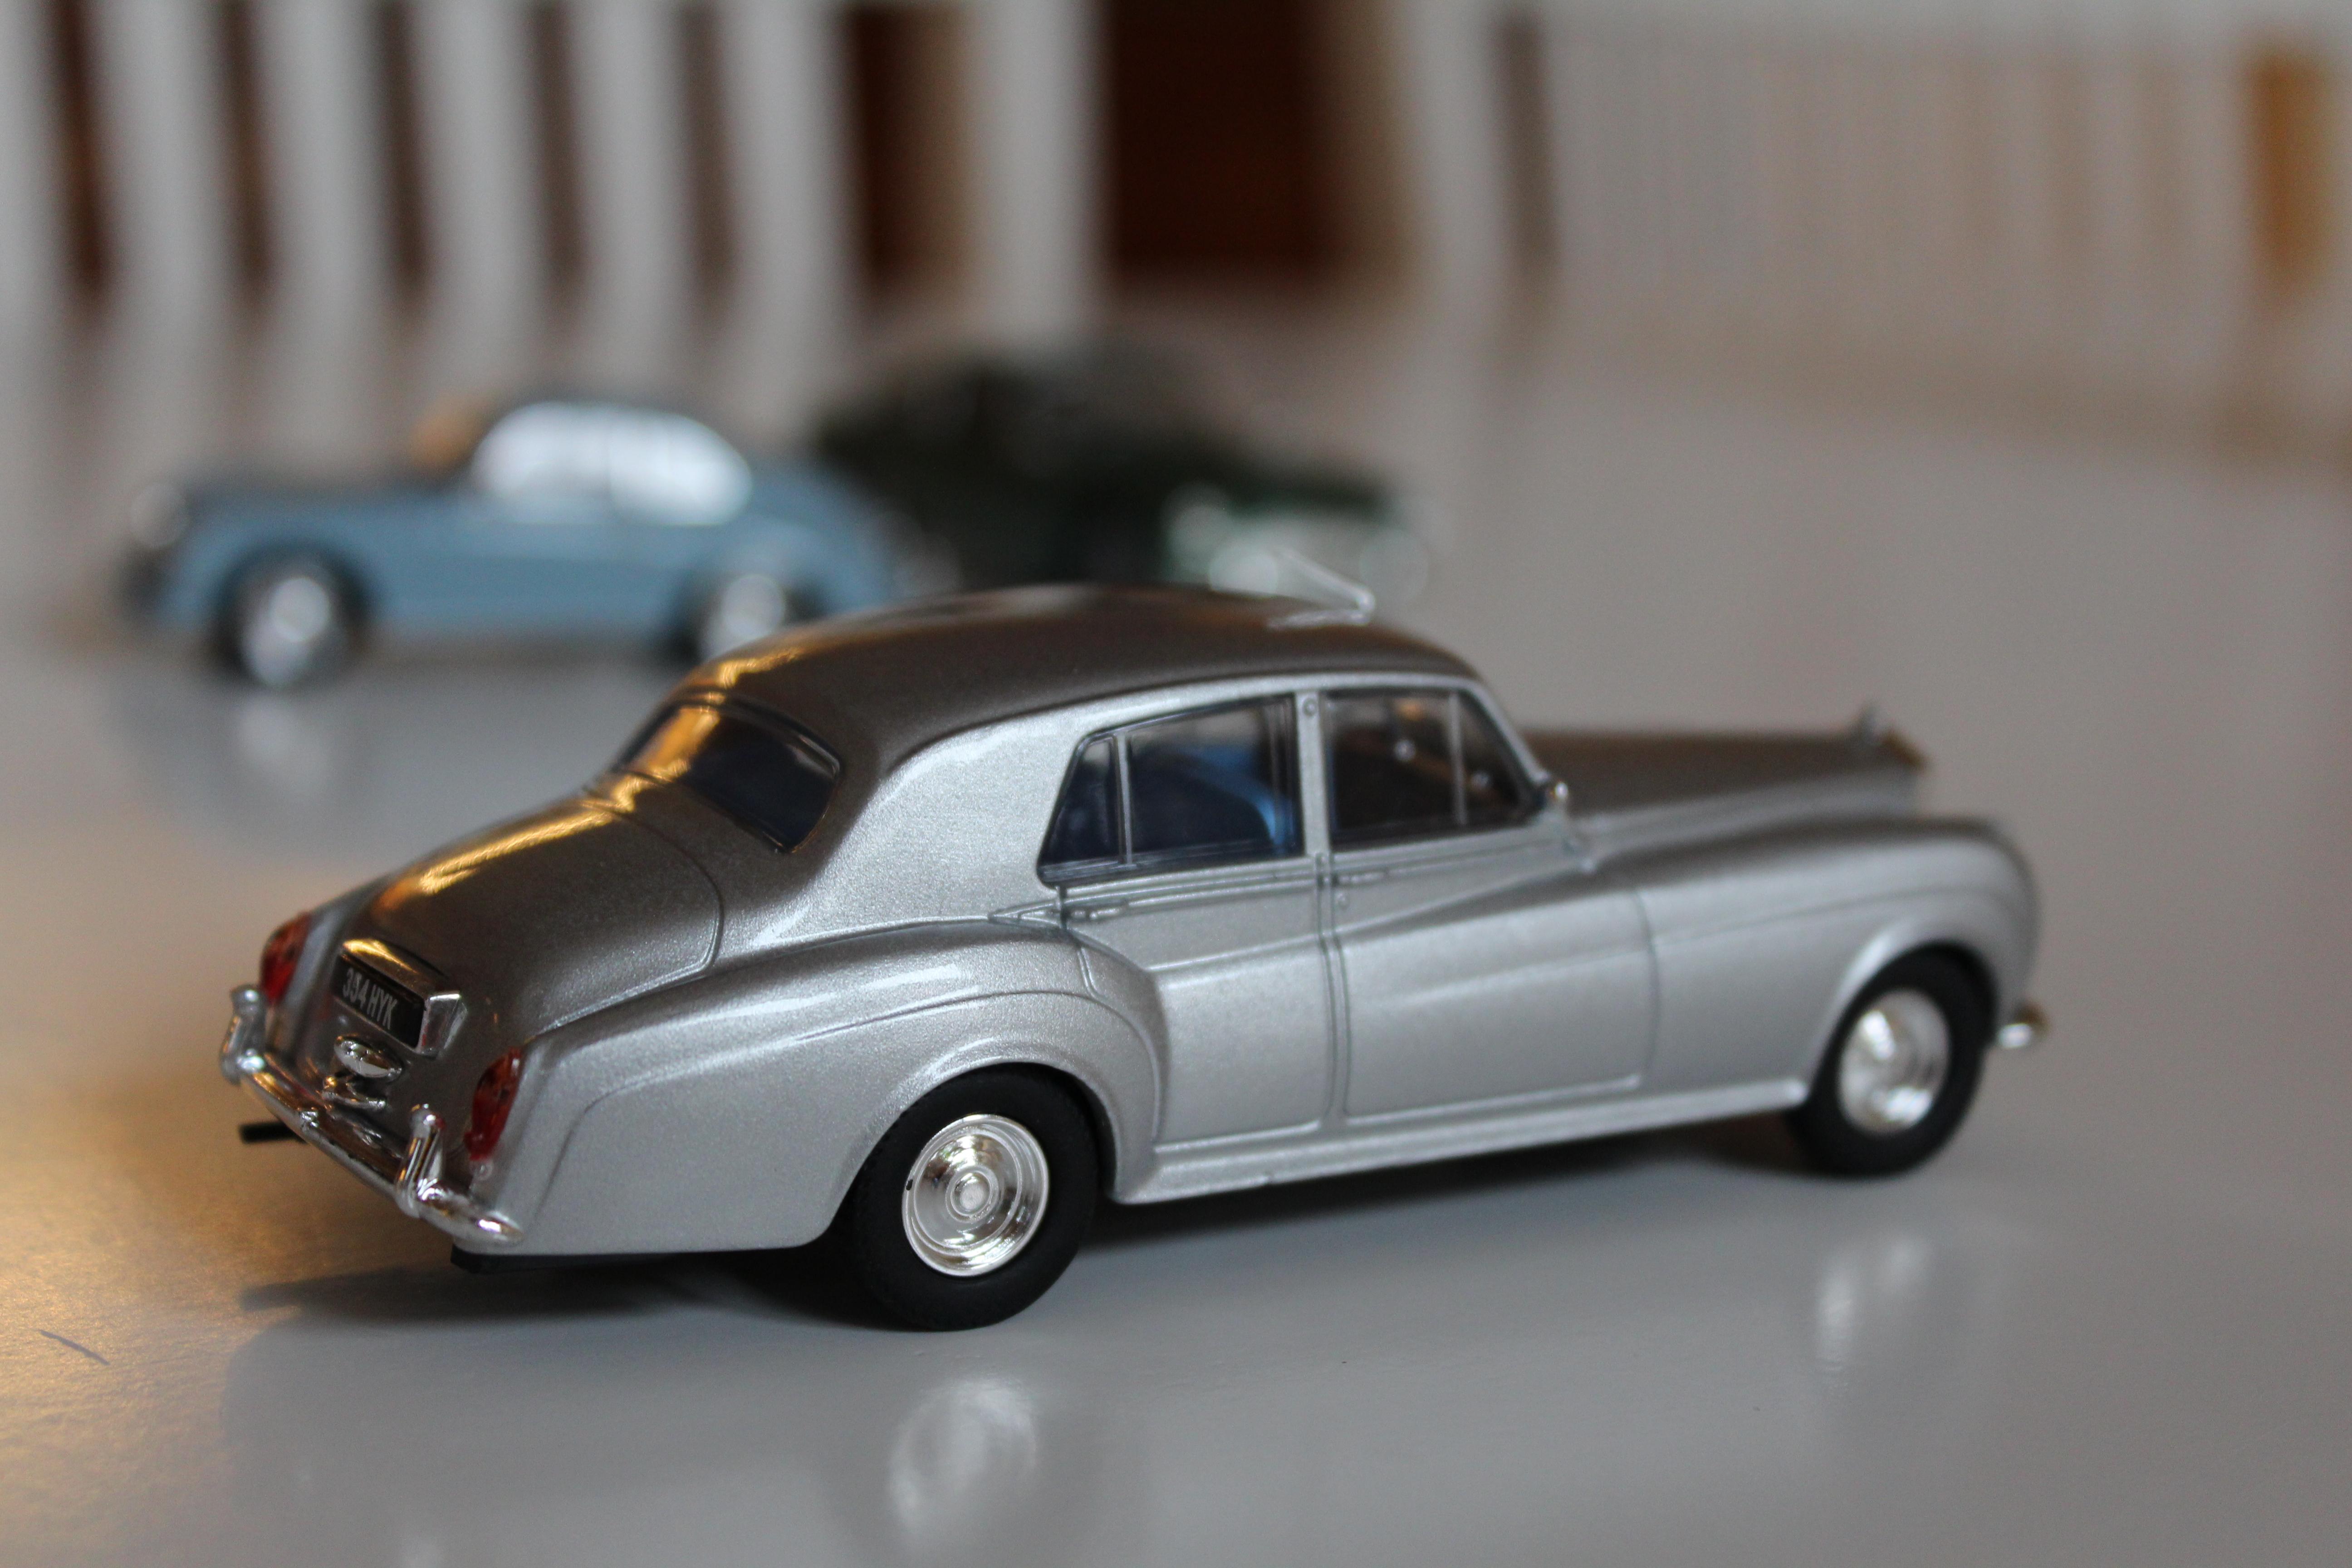 Rolls Royce Silver Cloud med sin lite bakåtlutade stance.